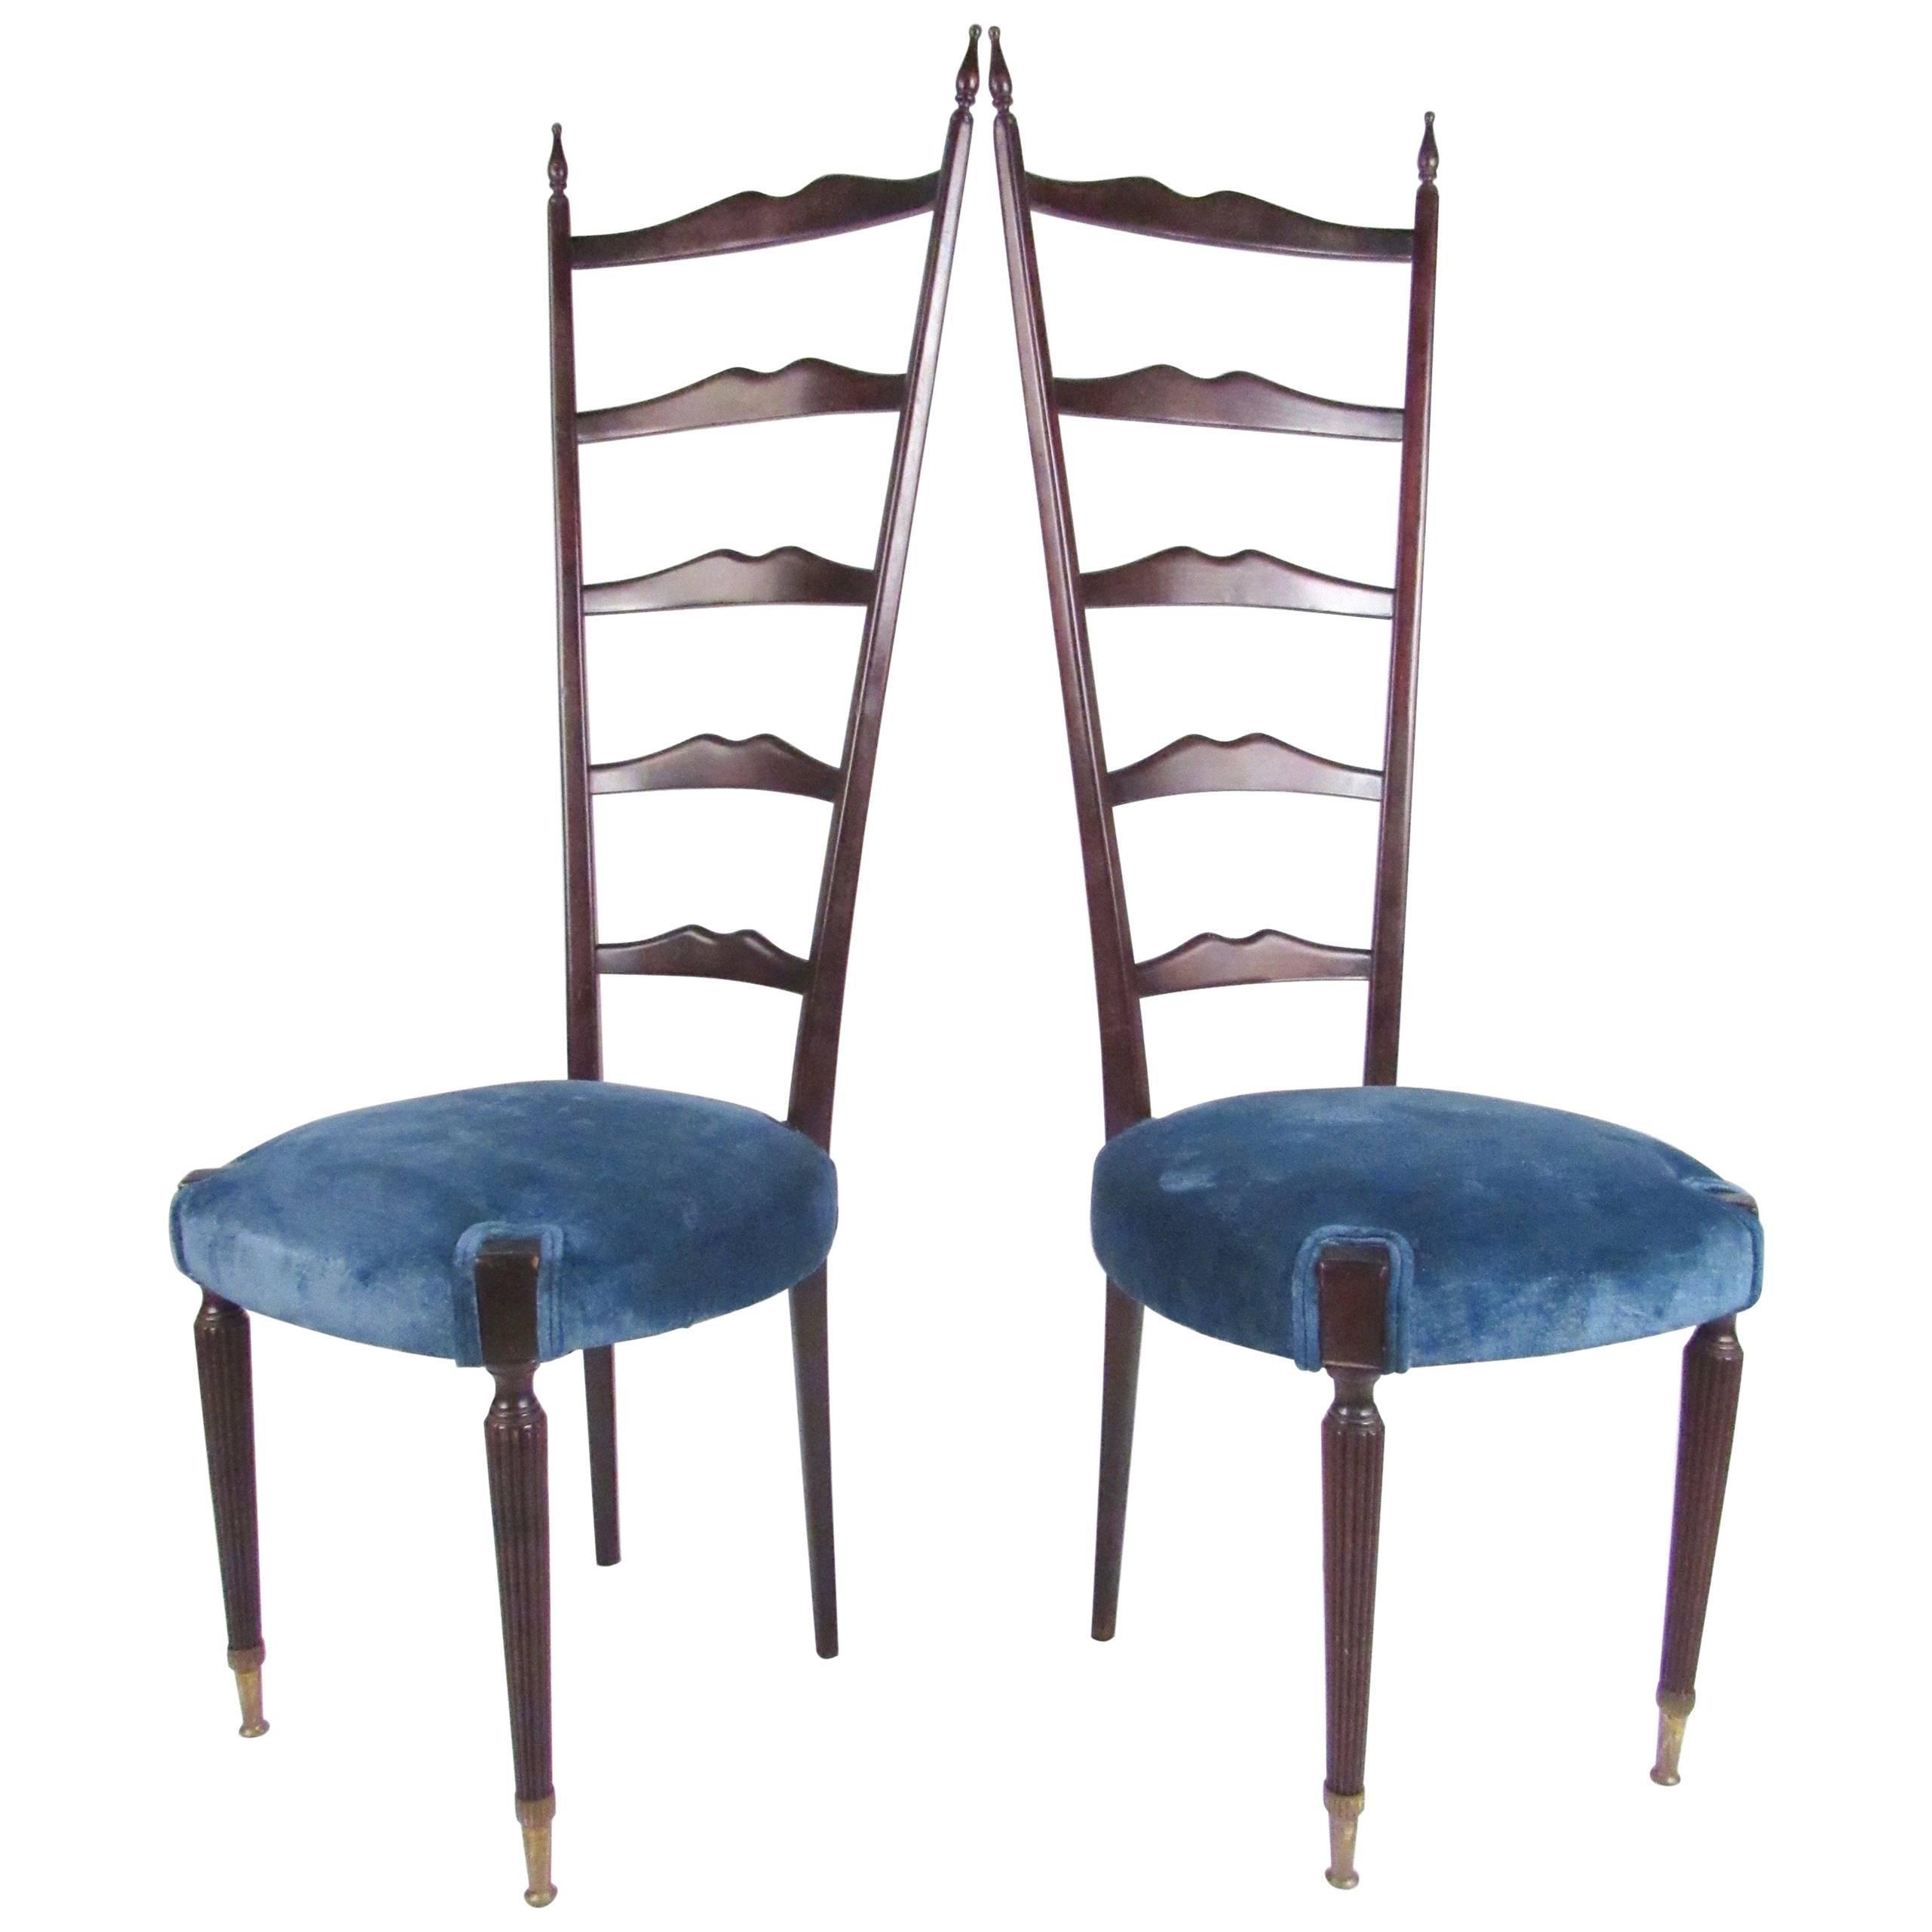 Pair of Vintage Modern Chiavari Style High Back Chairs